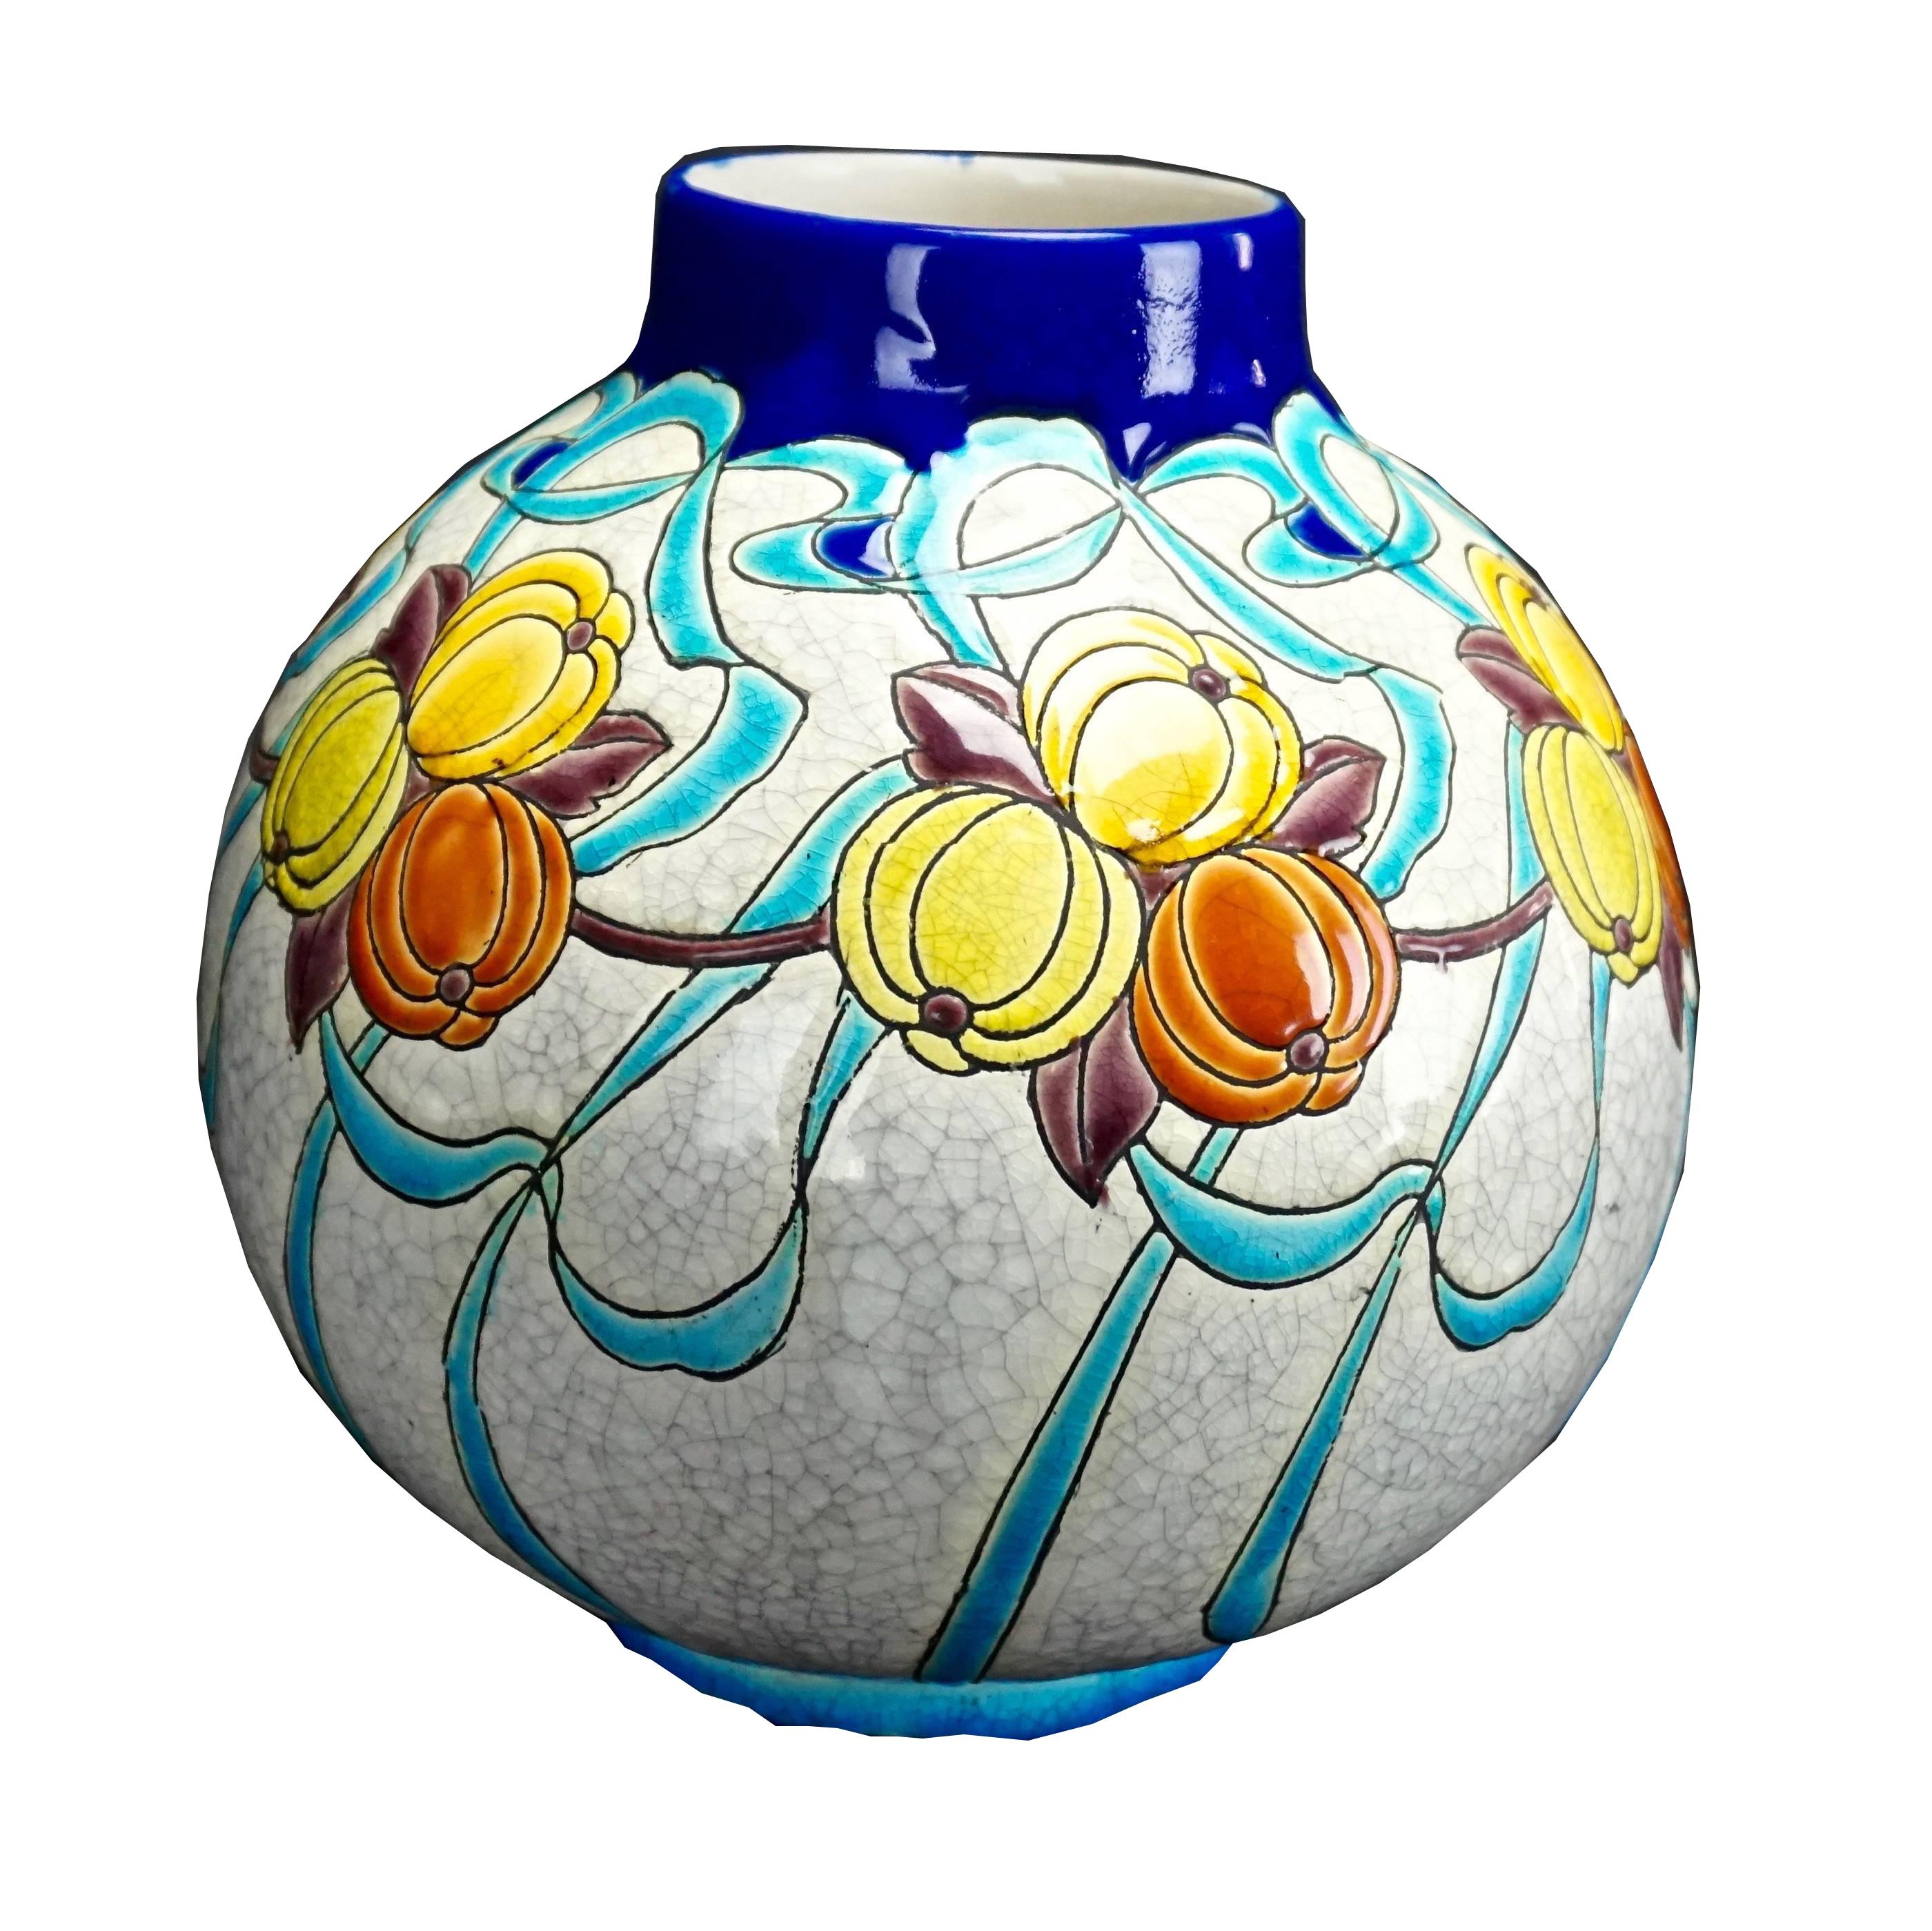 Charles Catteau Boch Freres Keramis Art Deco Vase D745 F894 Modernism